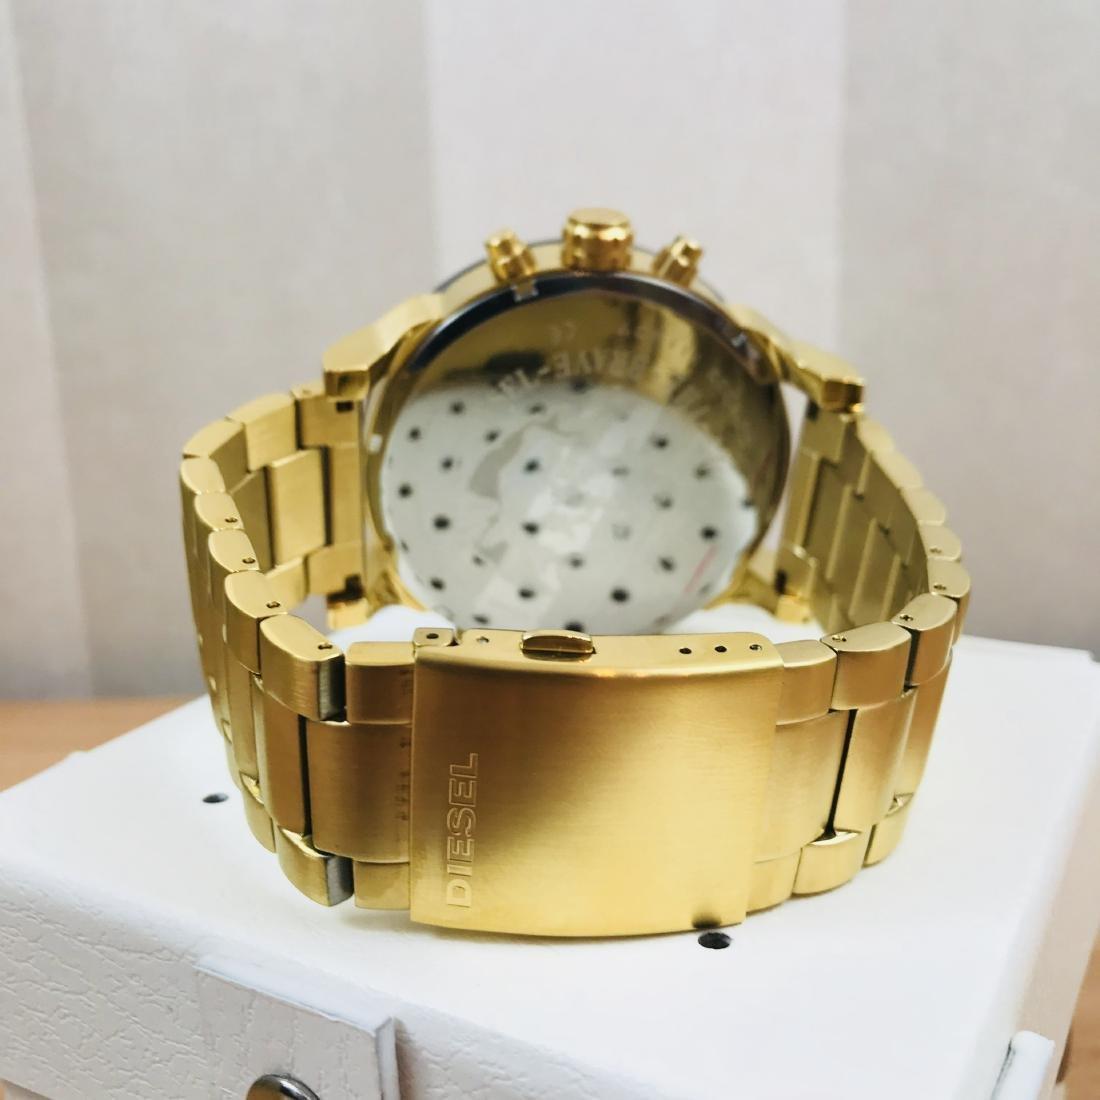 Diesel – Mr. Daddy 2.0 Big Gold Plated Watch - 3